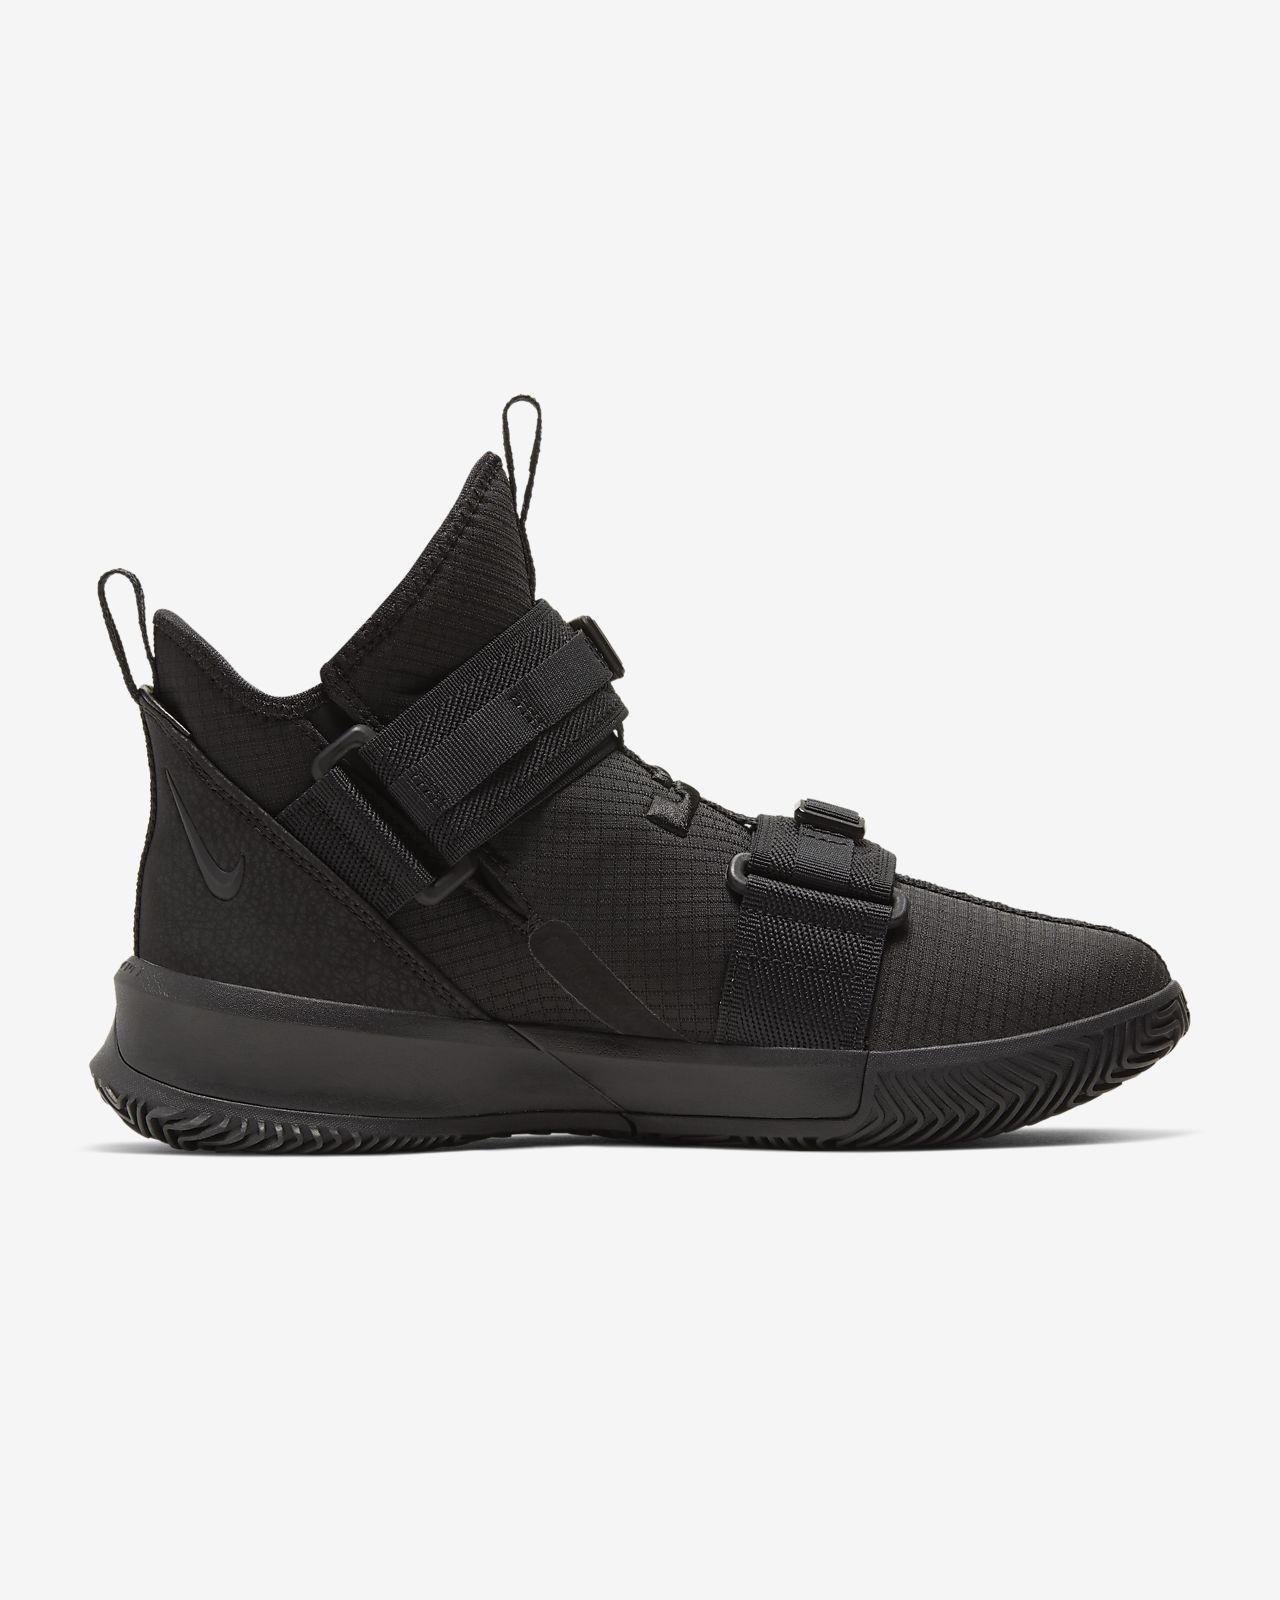 Buty Nike LeBron Soldier XIII SFG AR4225 005